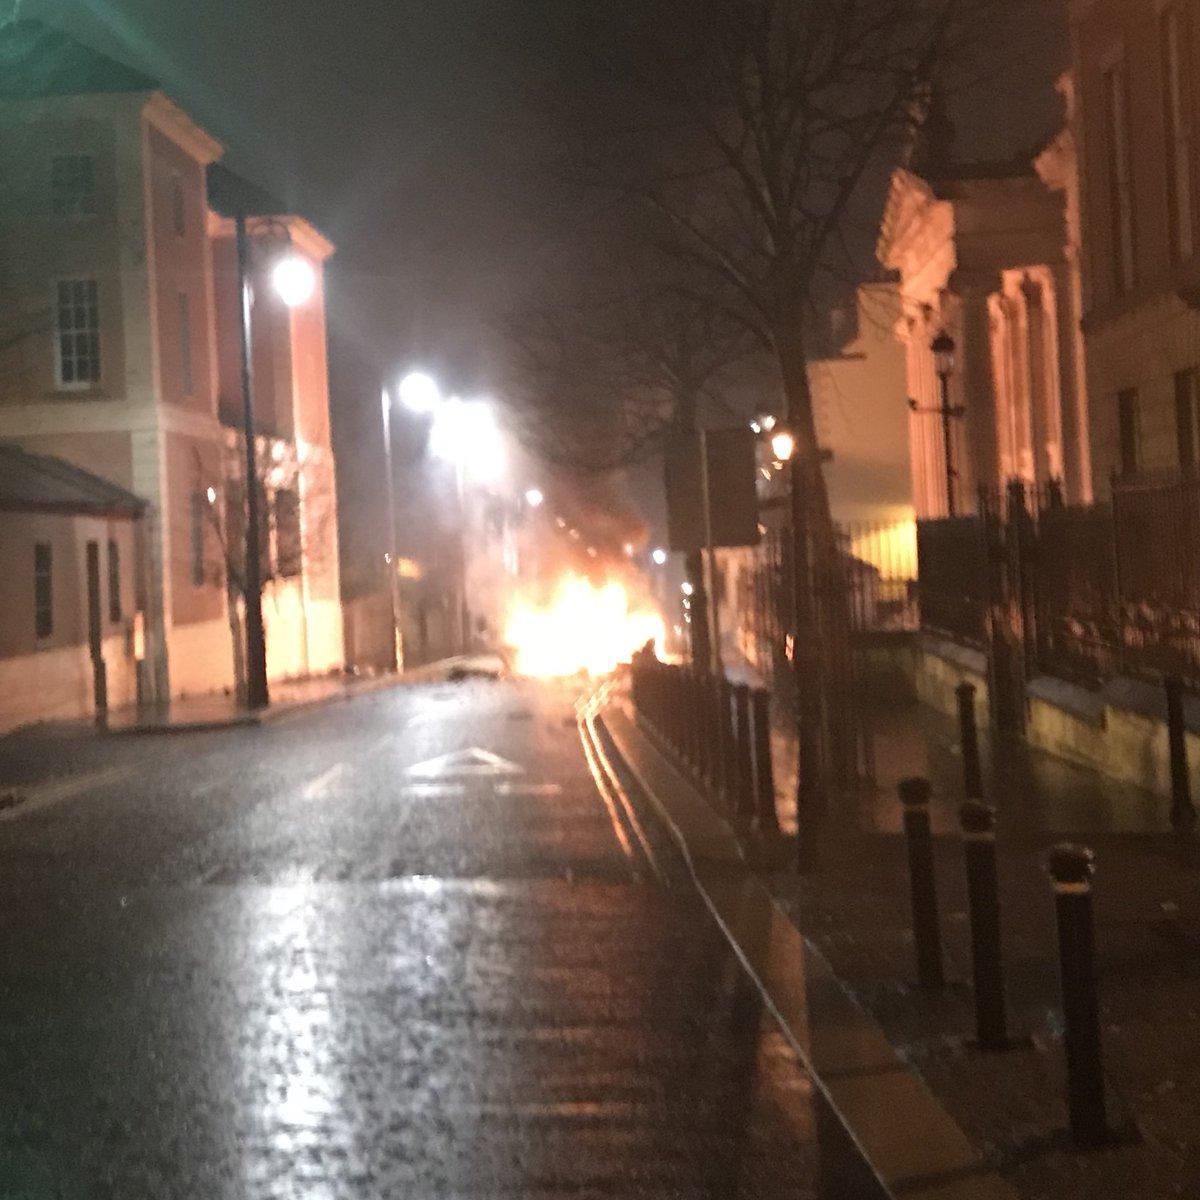 Suspected car bombing in Northern Ireland